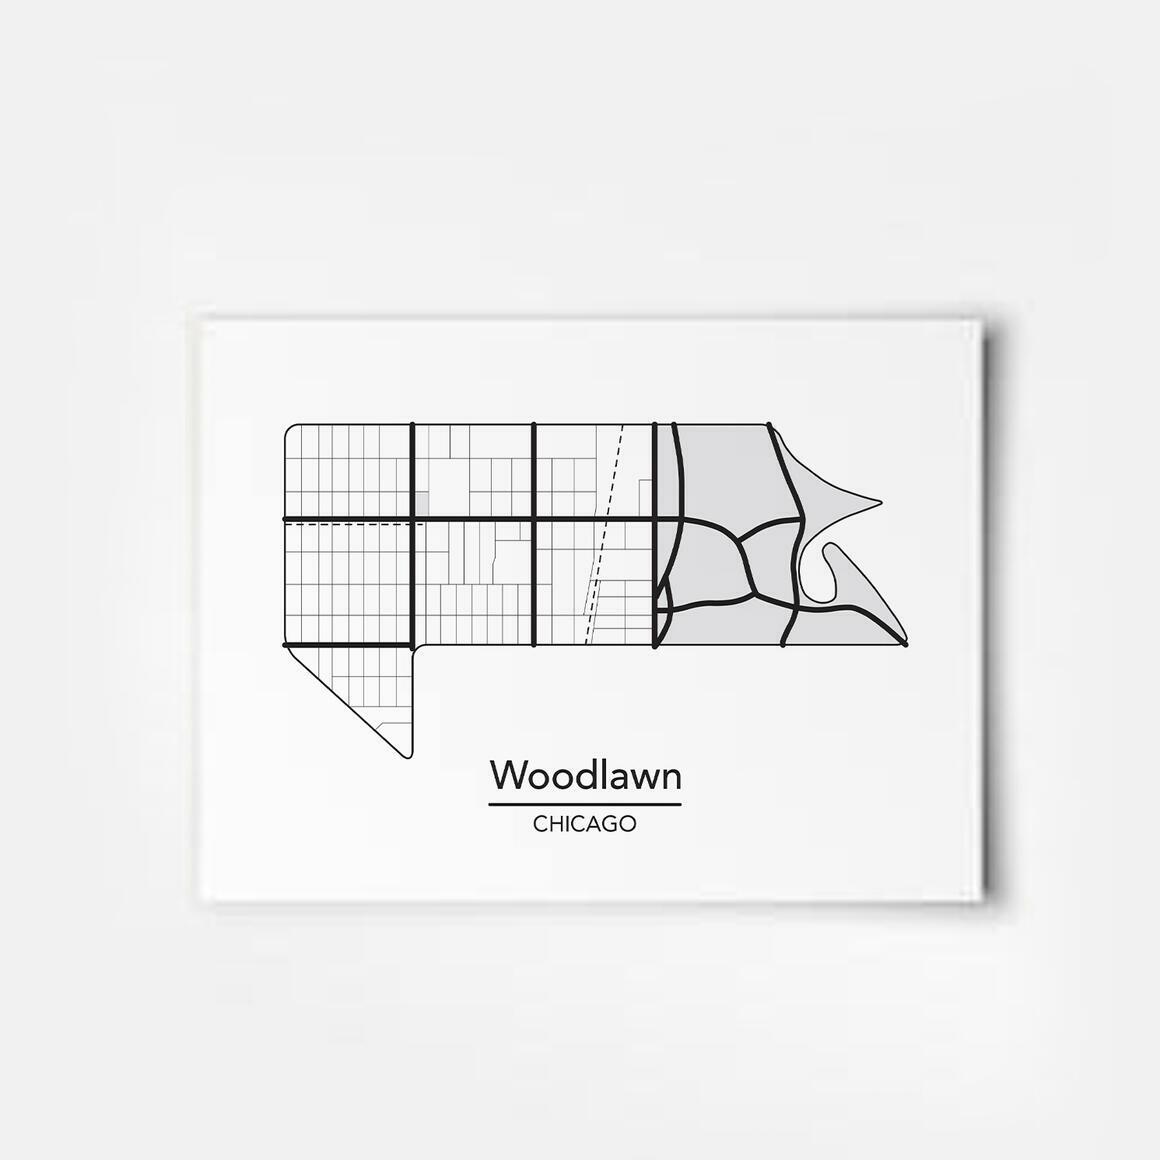 Woodlawn - Chicago Neighborhood Map Print | Trada Marketplace